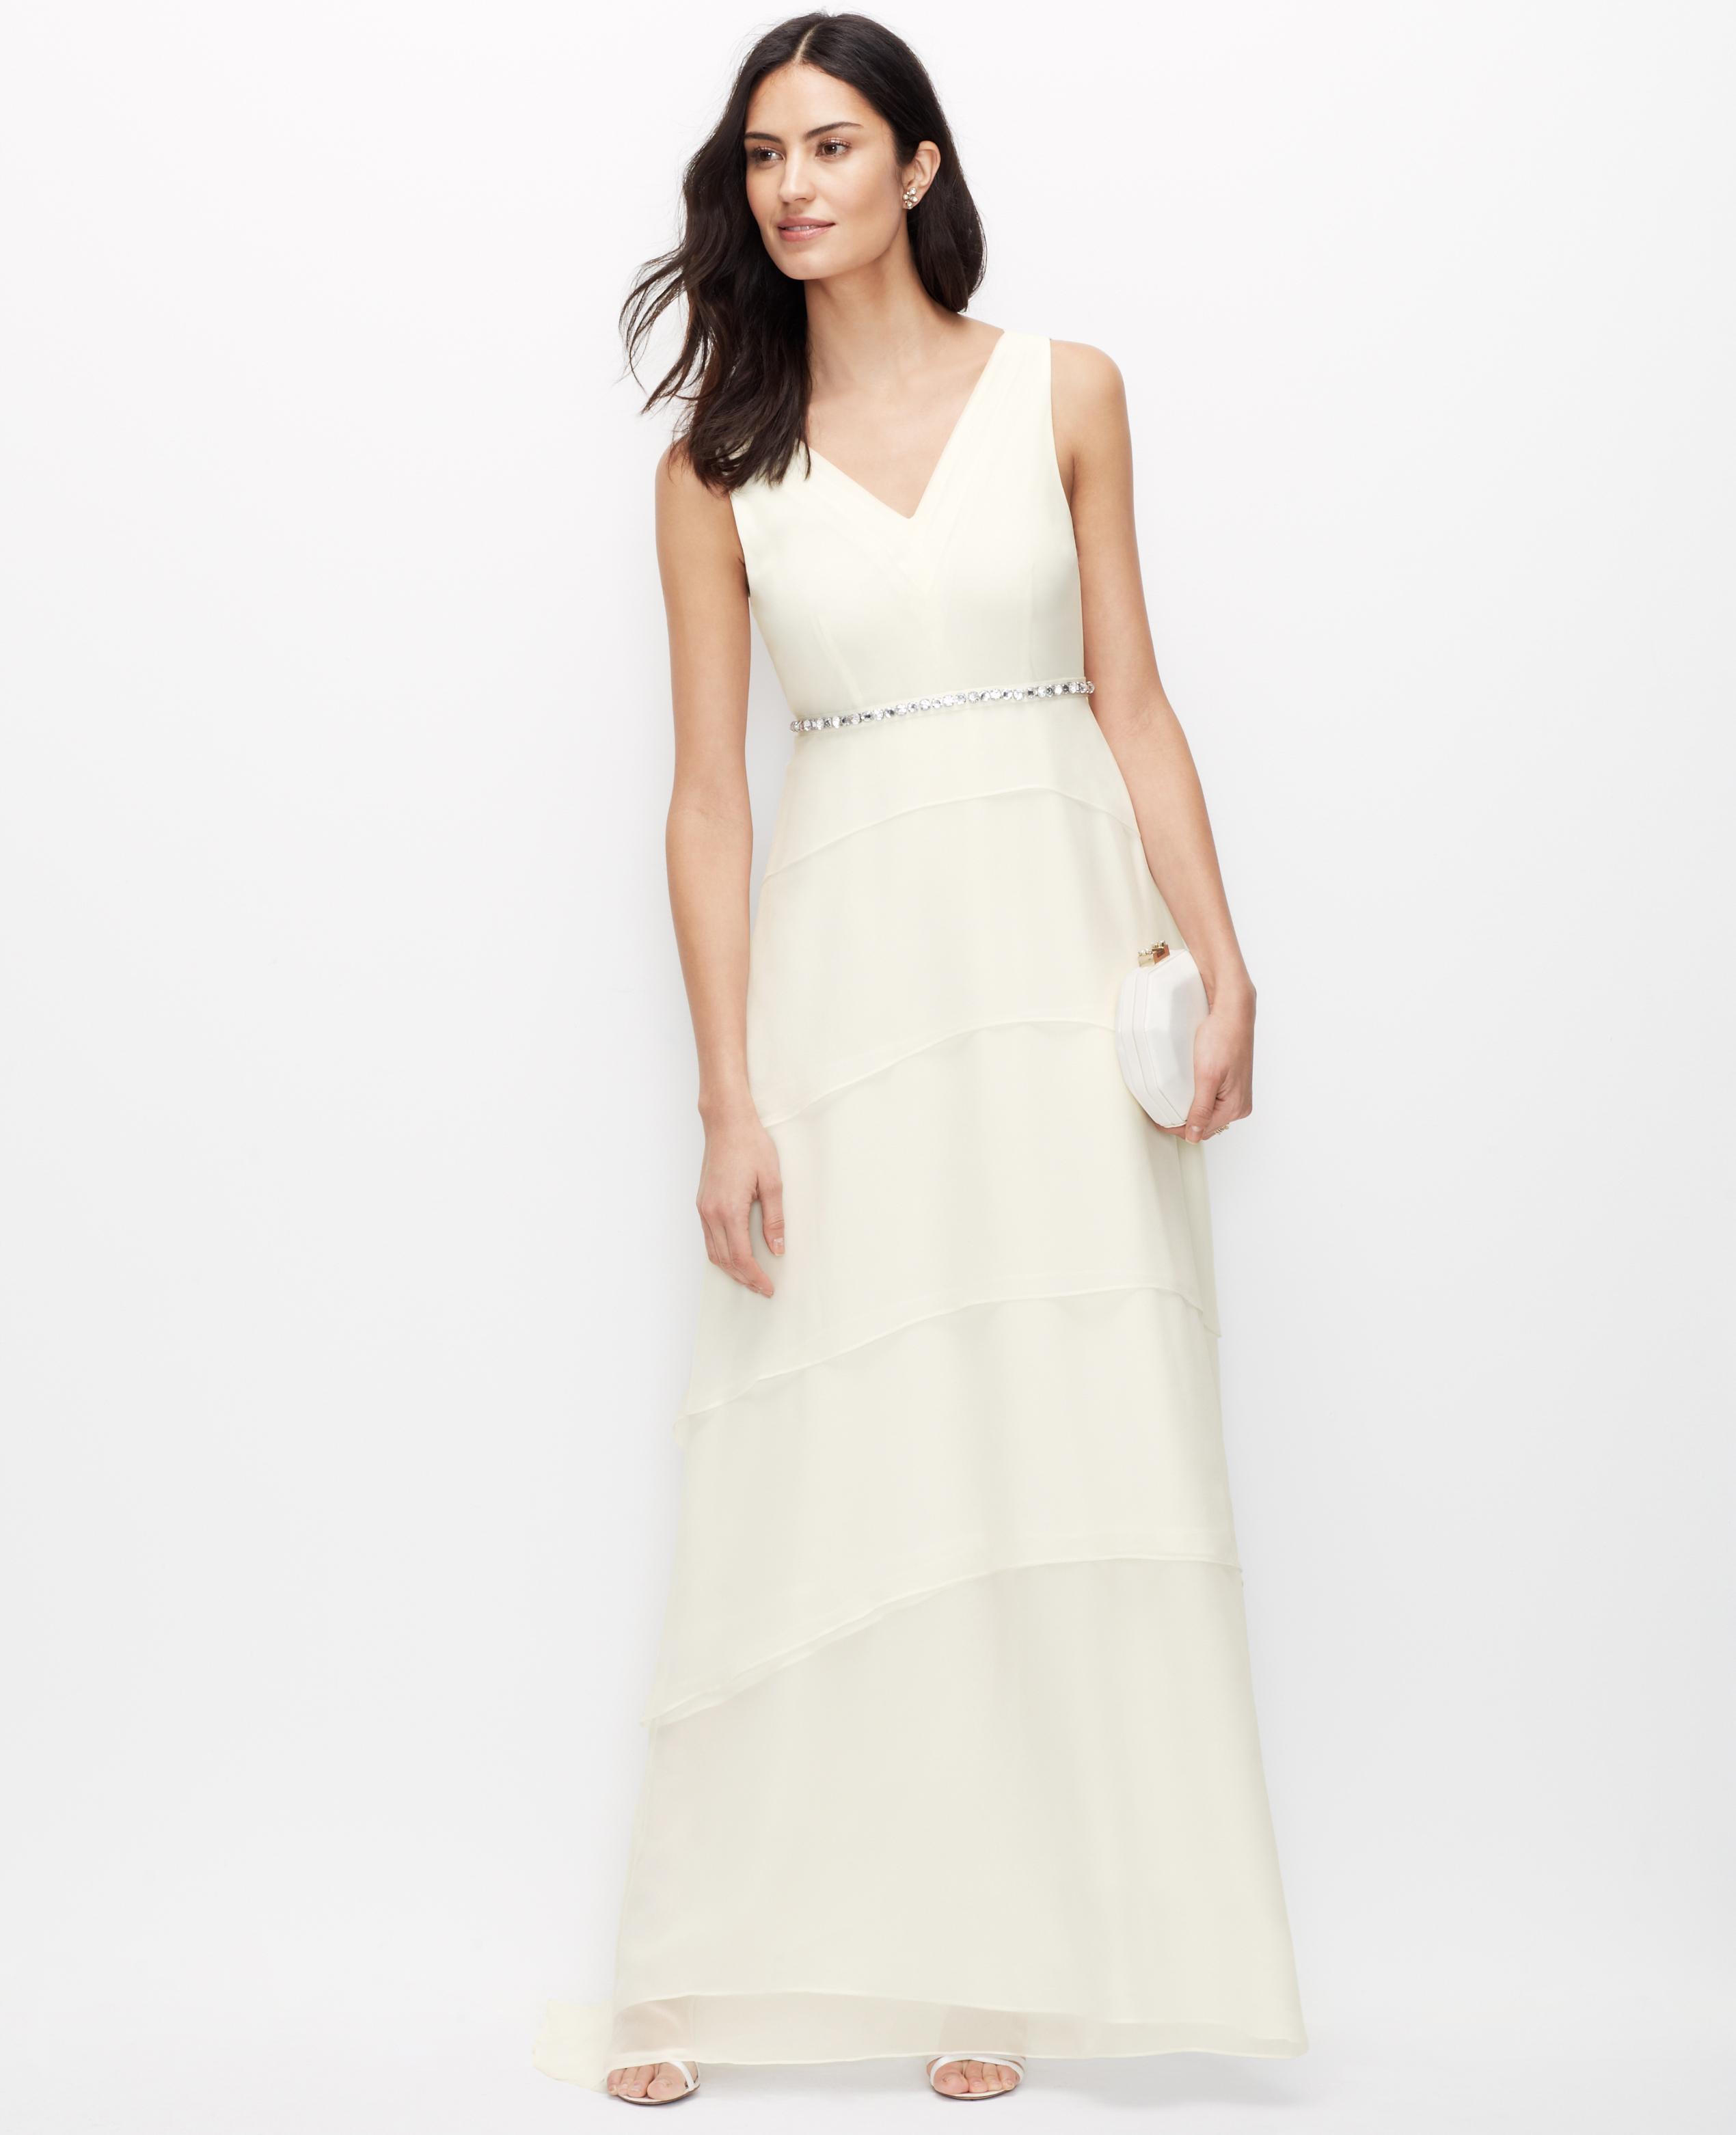 Lyst ann taylor tiered silk georgette wedding dress in white for Silk georgette wedding dress